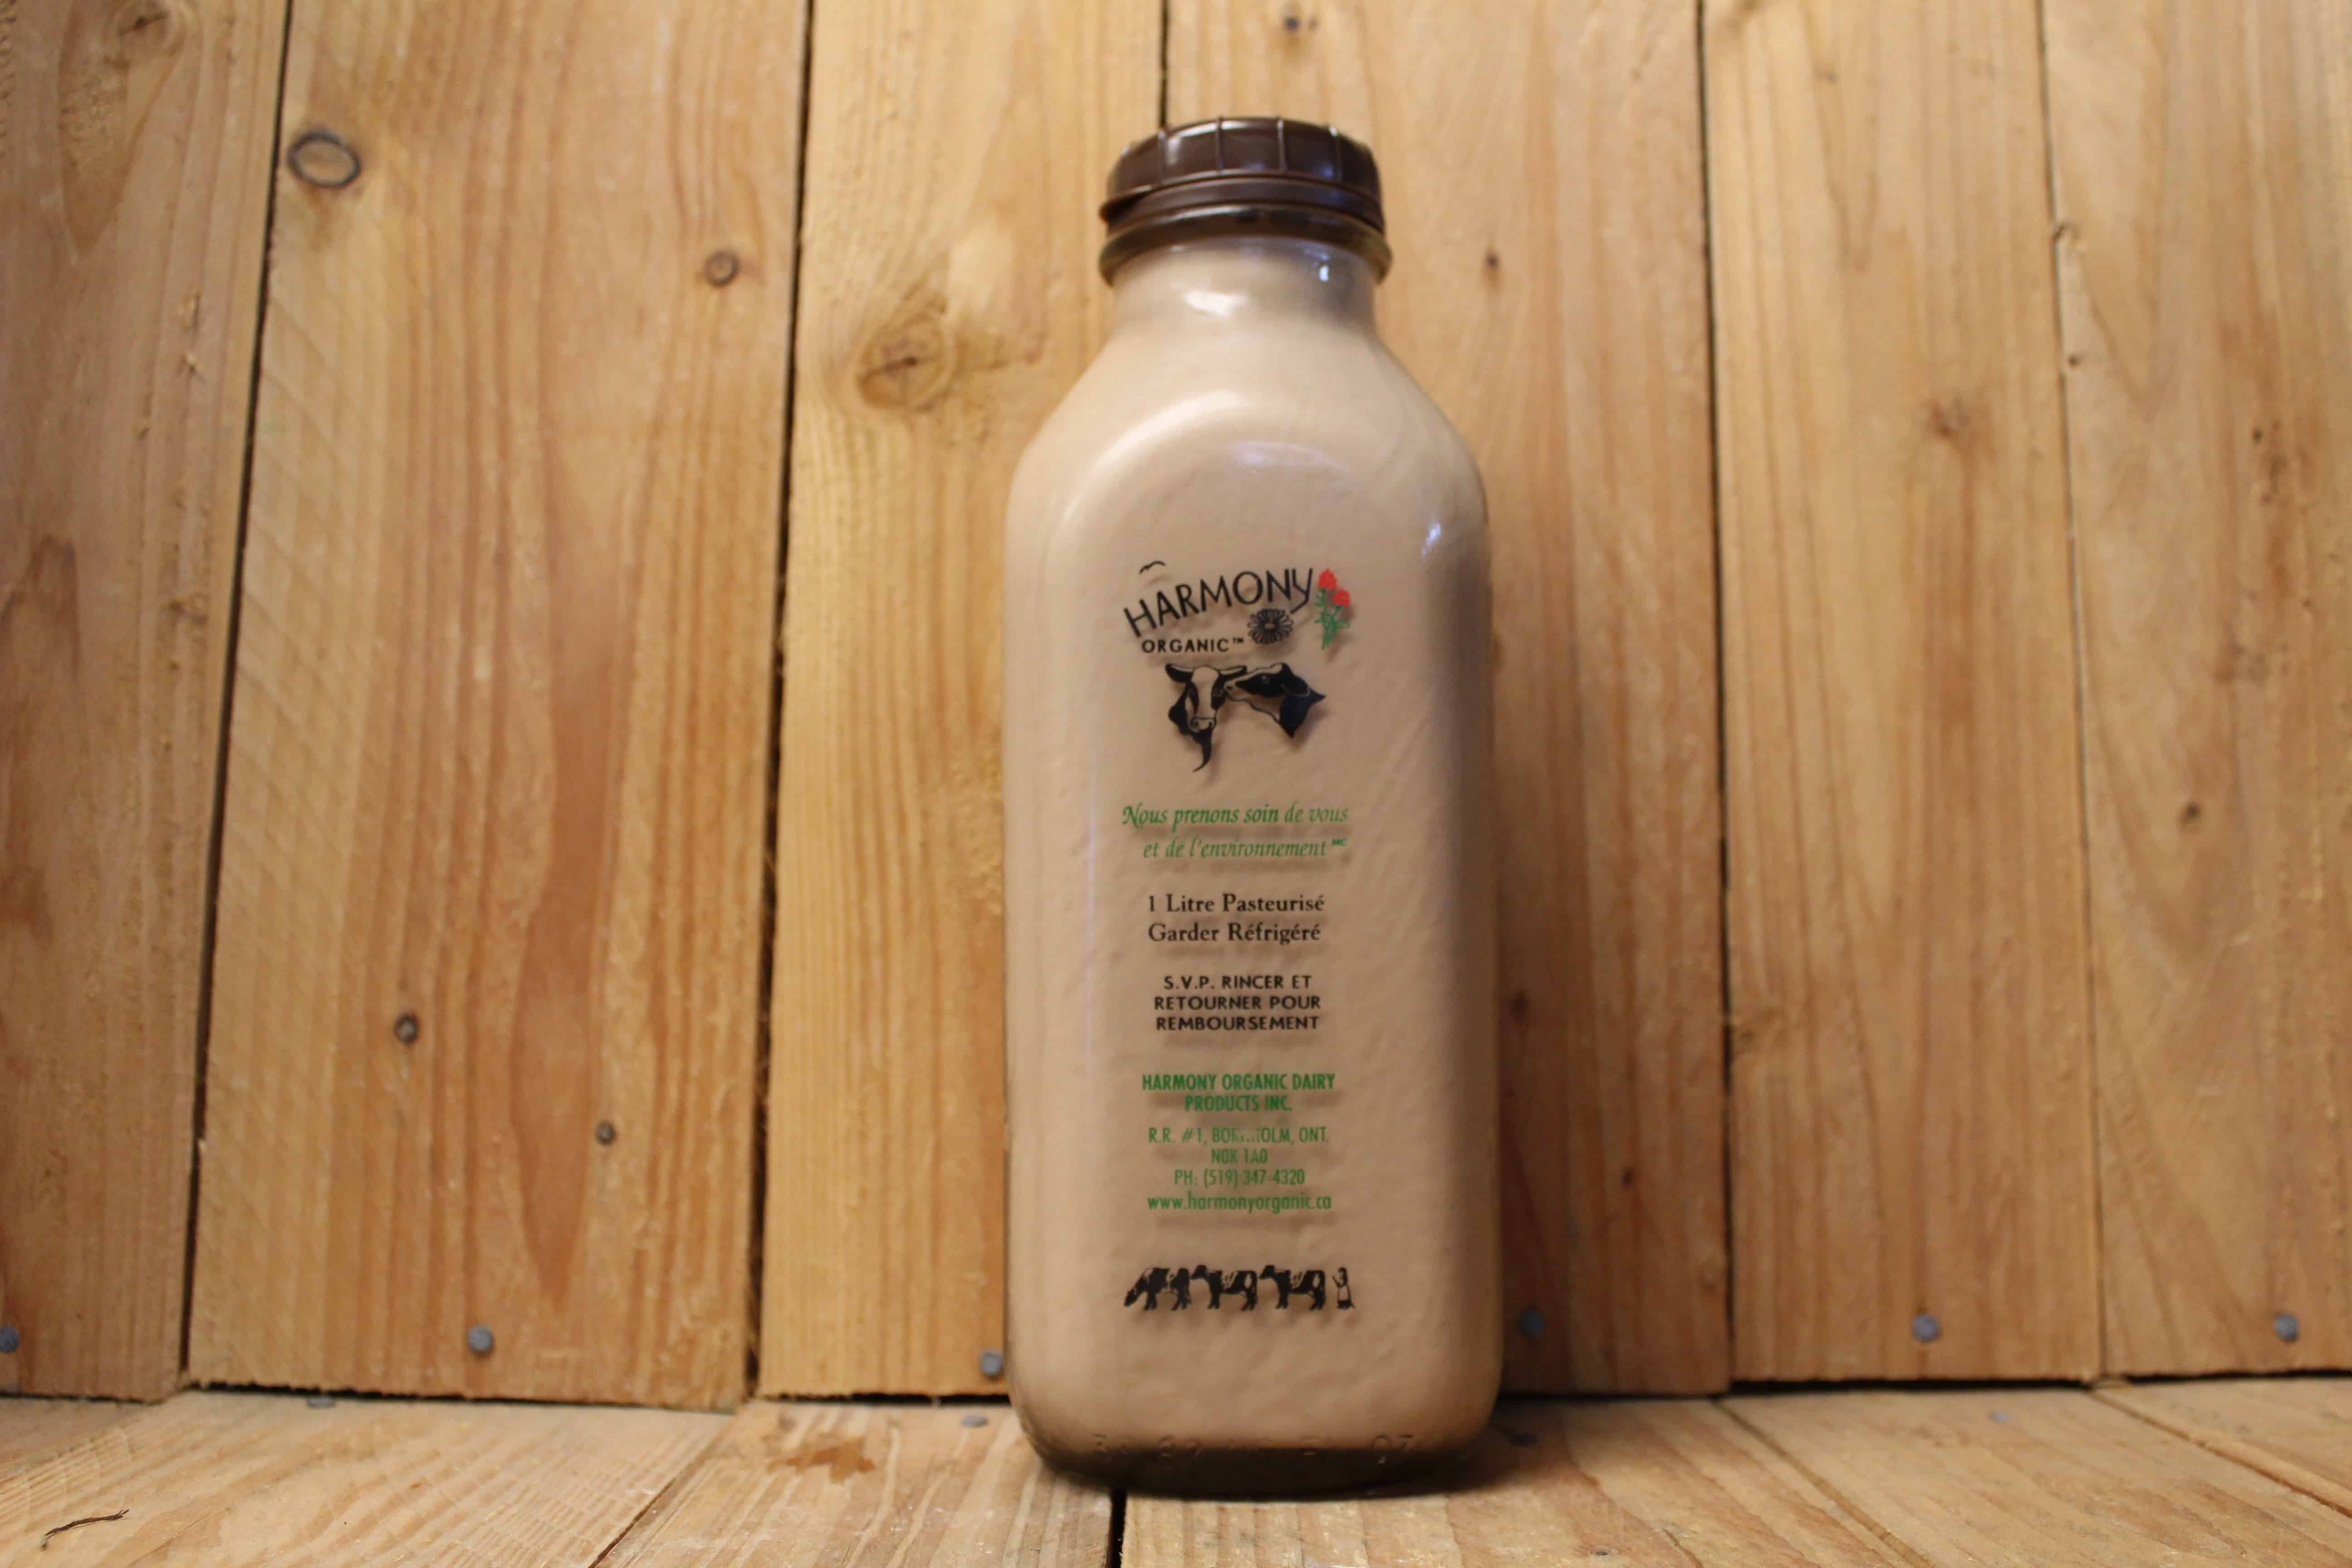 Harmony Dairy – 3.8% Chocolate Milk (1L Bottle) INCLUDES $2 DEPOSIT